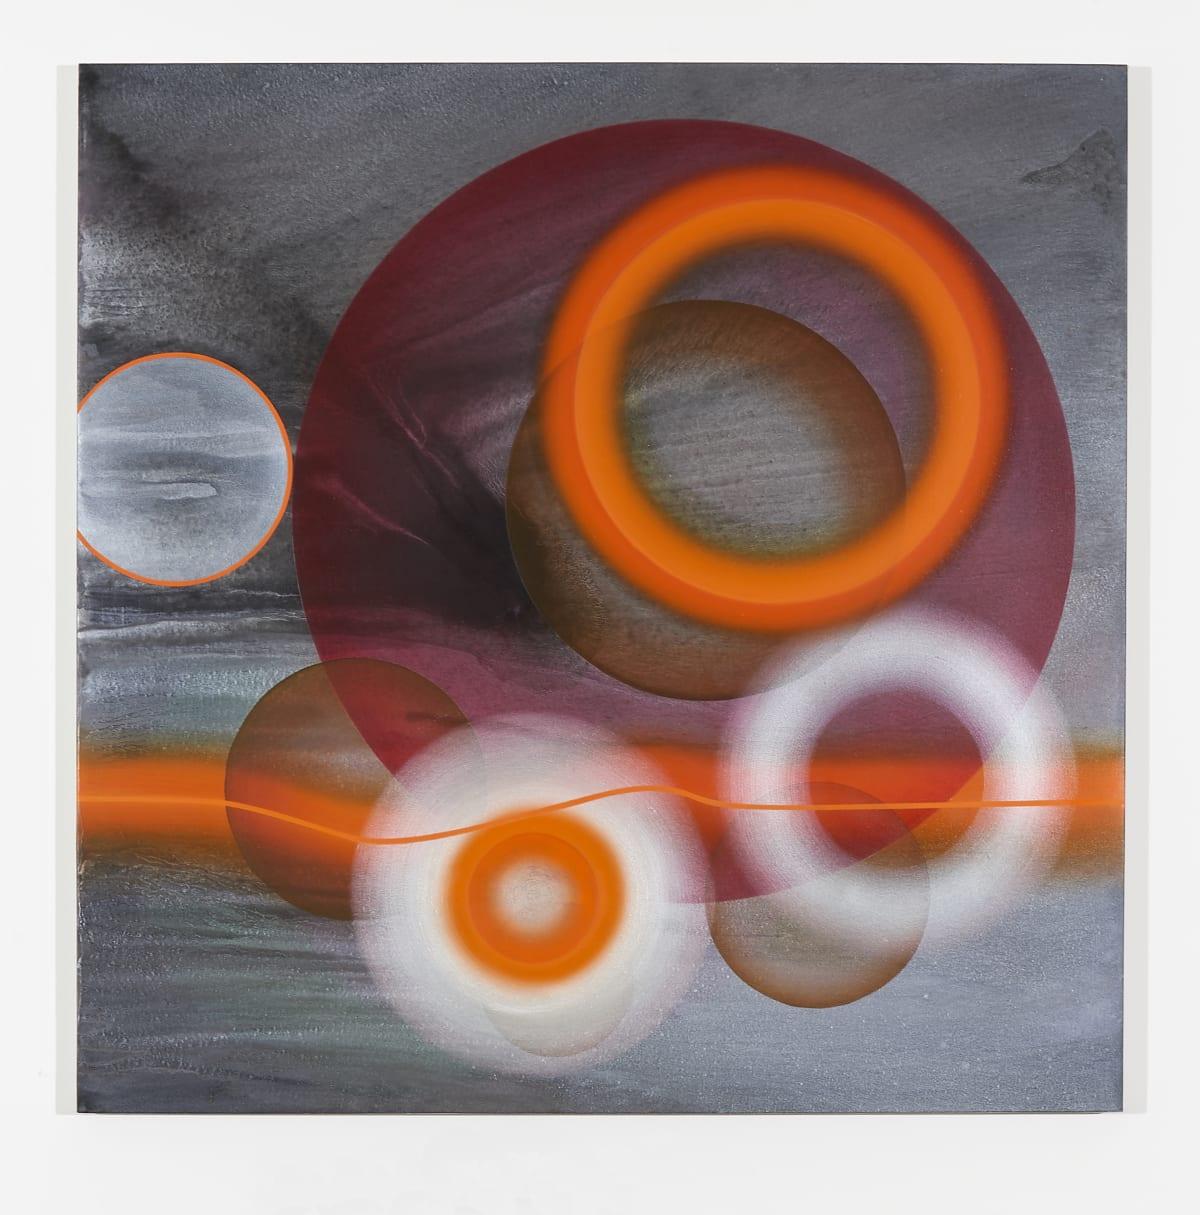 Marion Borgelt Exploding Stars with Cadmium Waves, 2019 oil, acrylic, silver leaf on canvas 120 x 120 cm